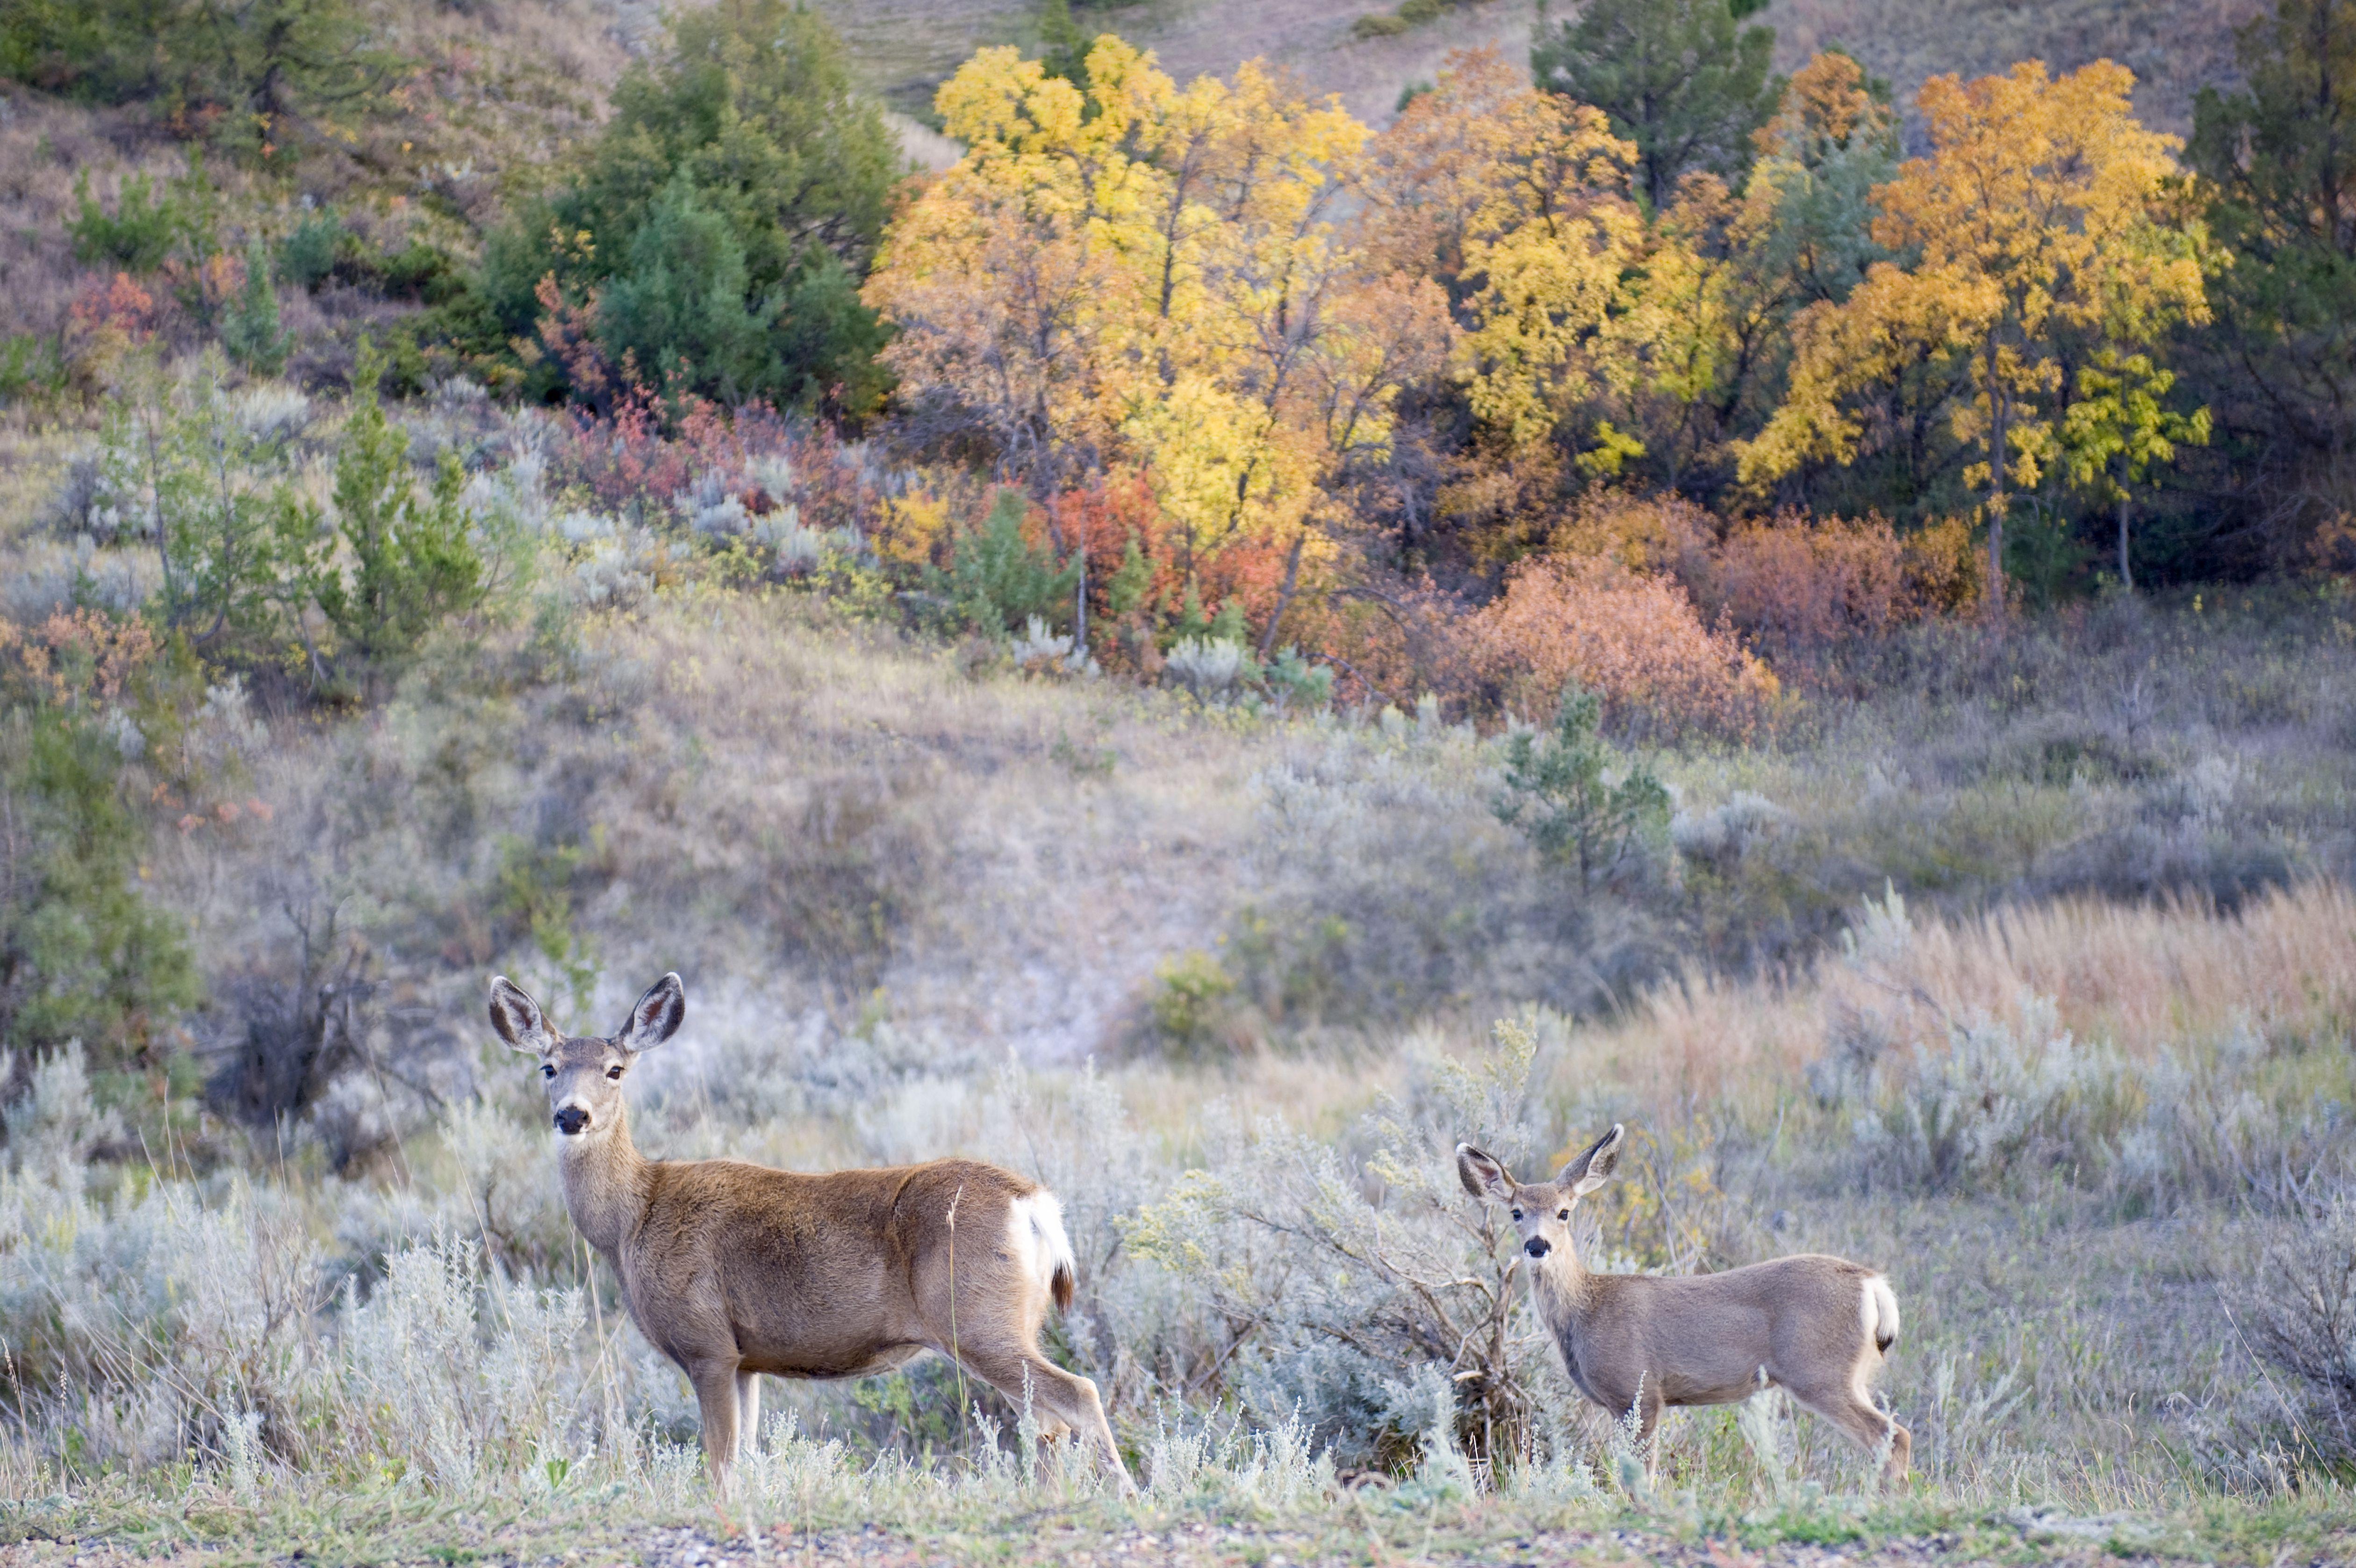 Deer in Theodore Roosevelt National Park